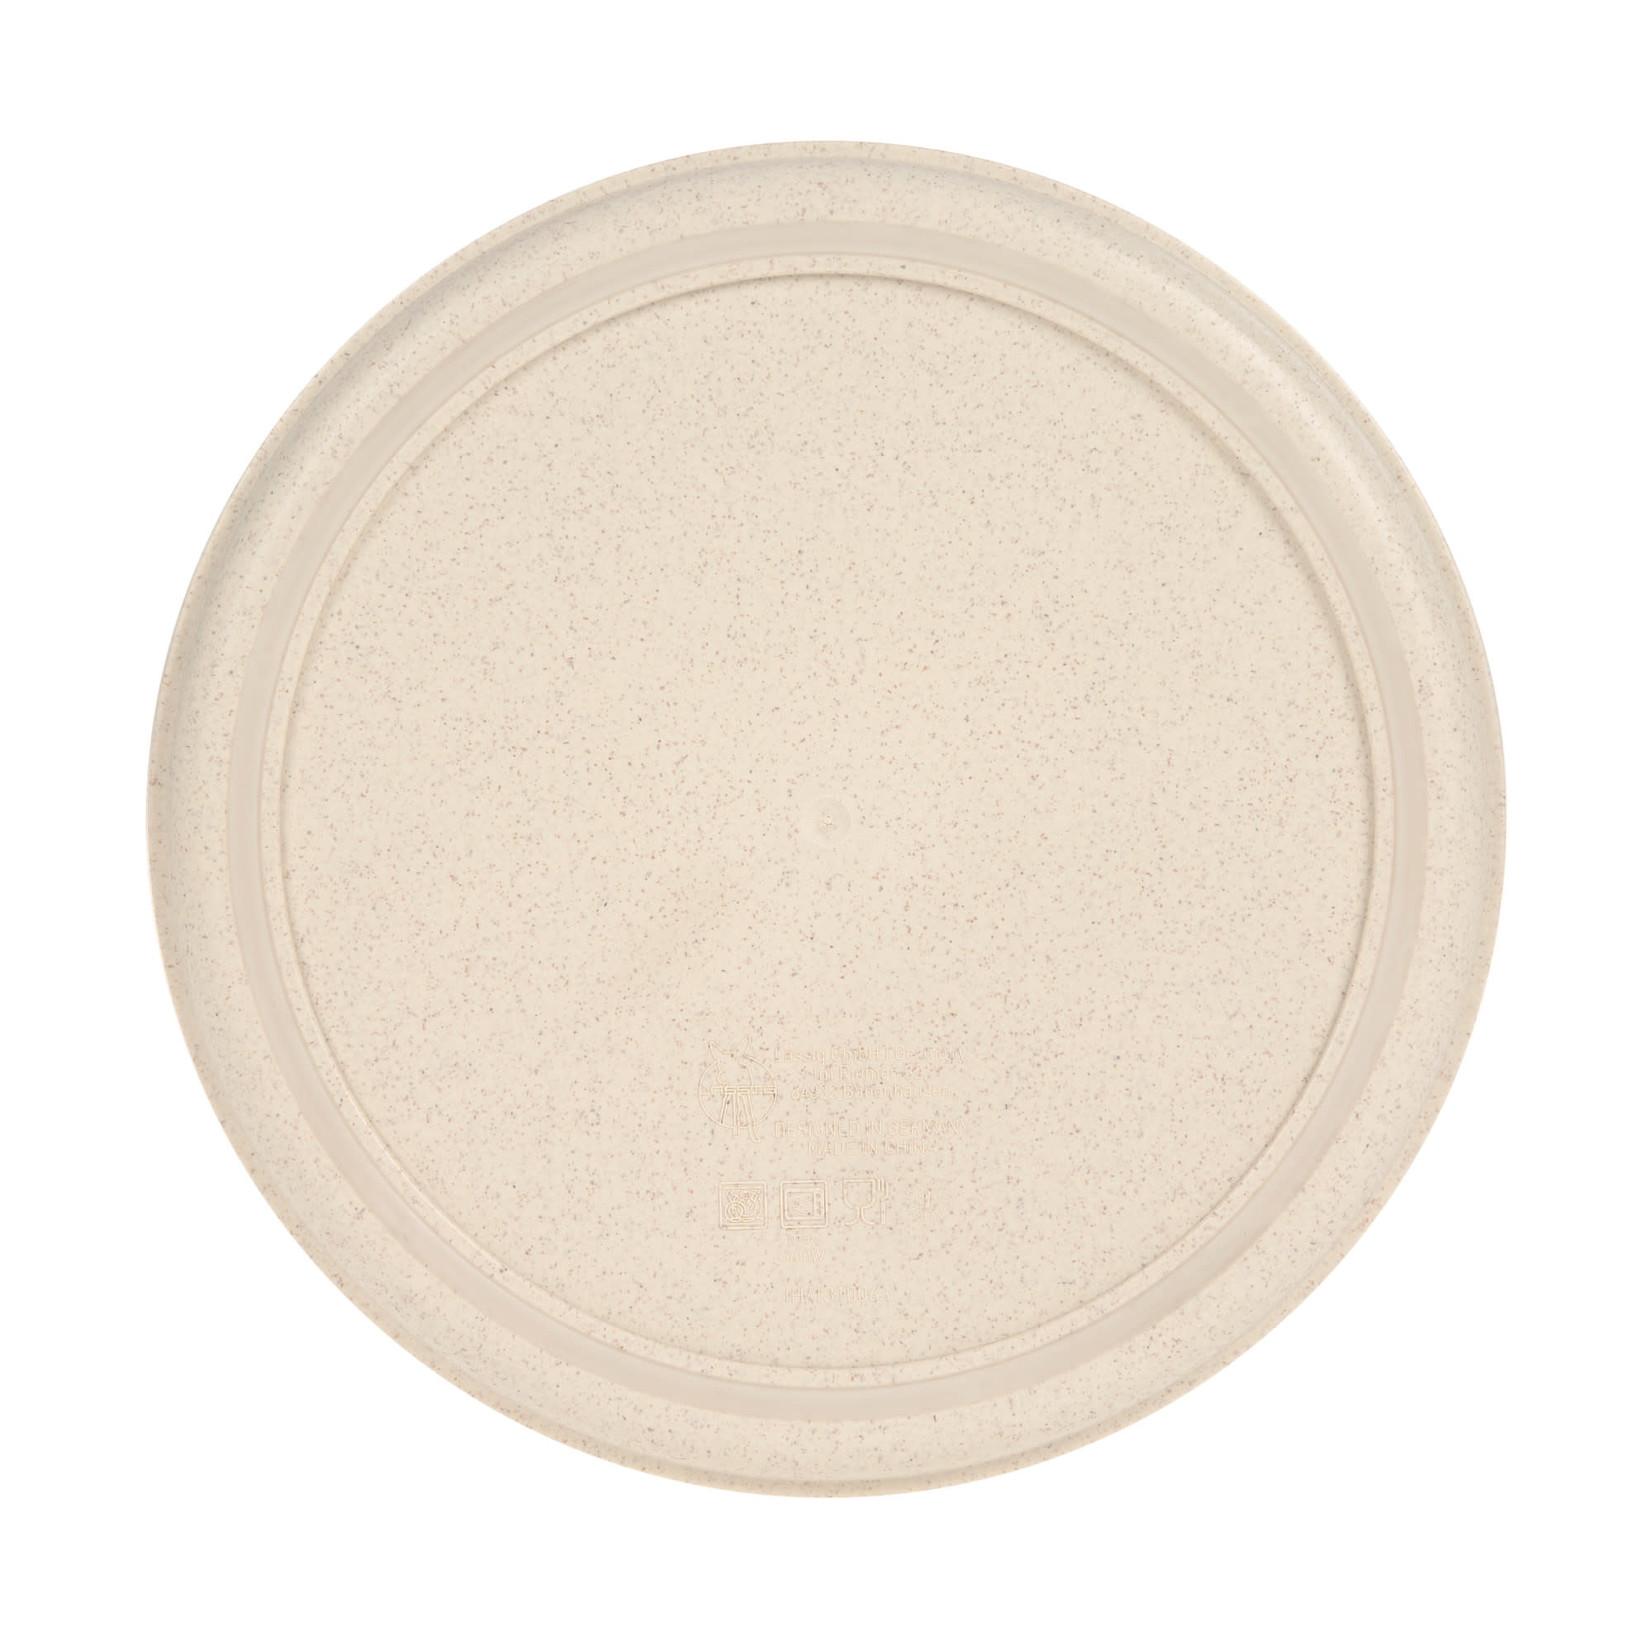 Lässig Plate P/Cellulose Tiny Farmer Sheep/Goose Nature